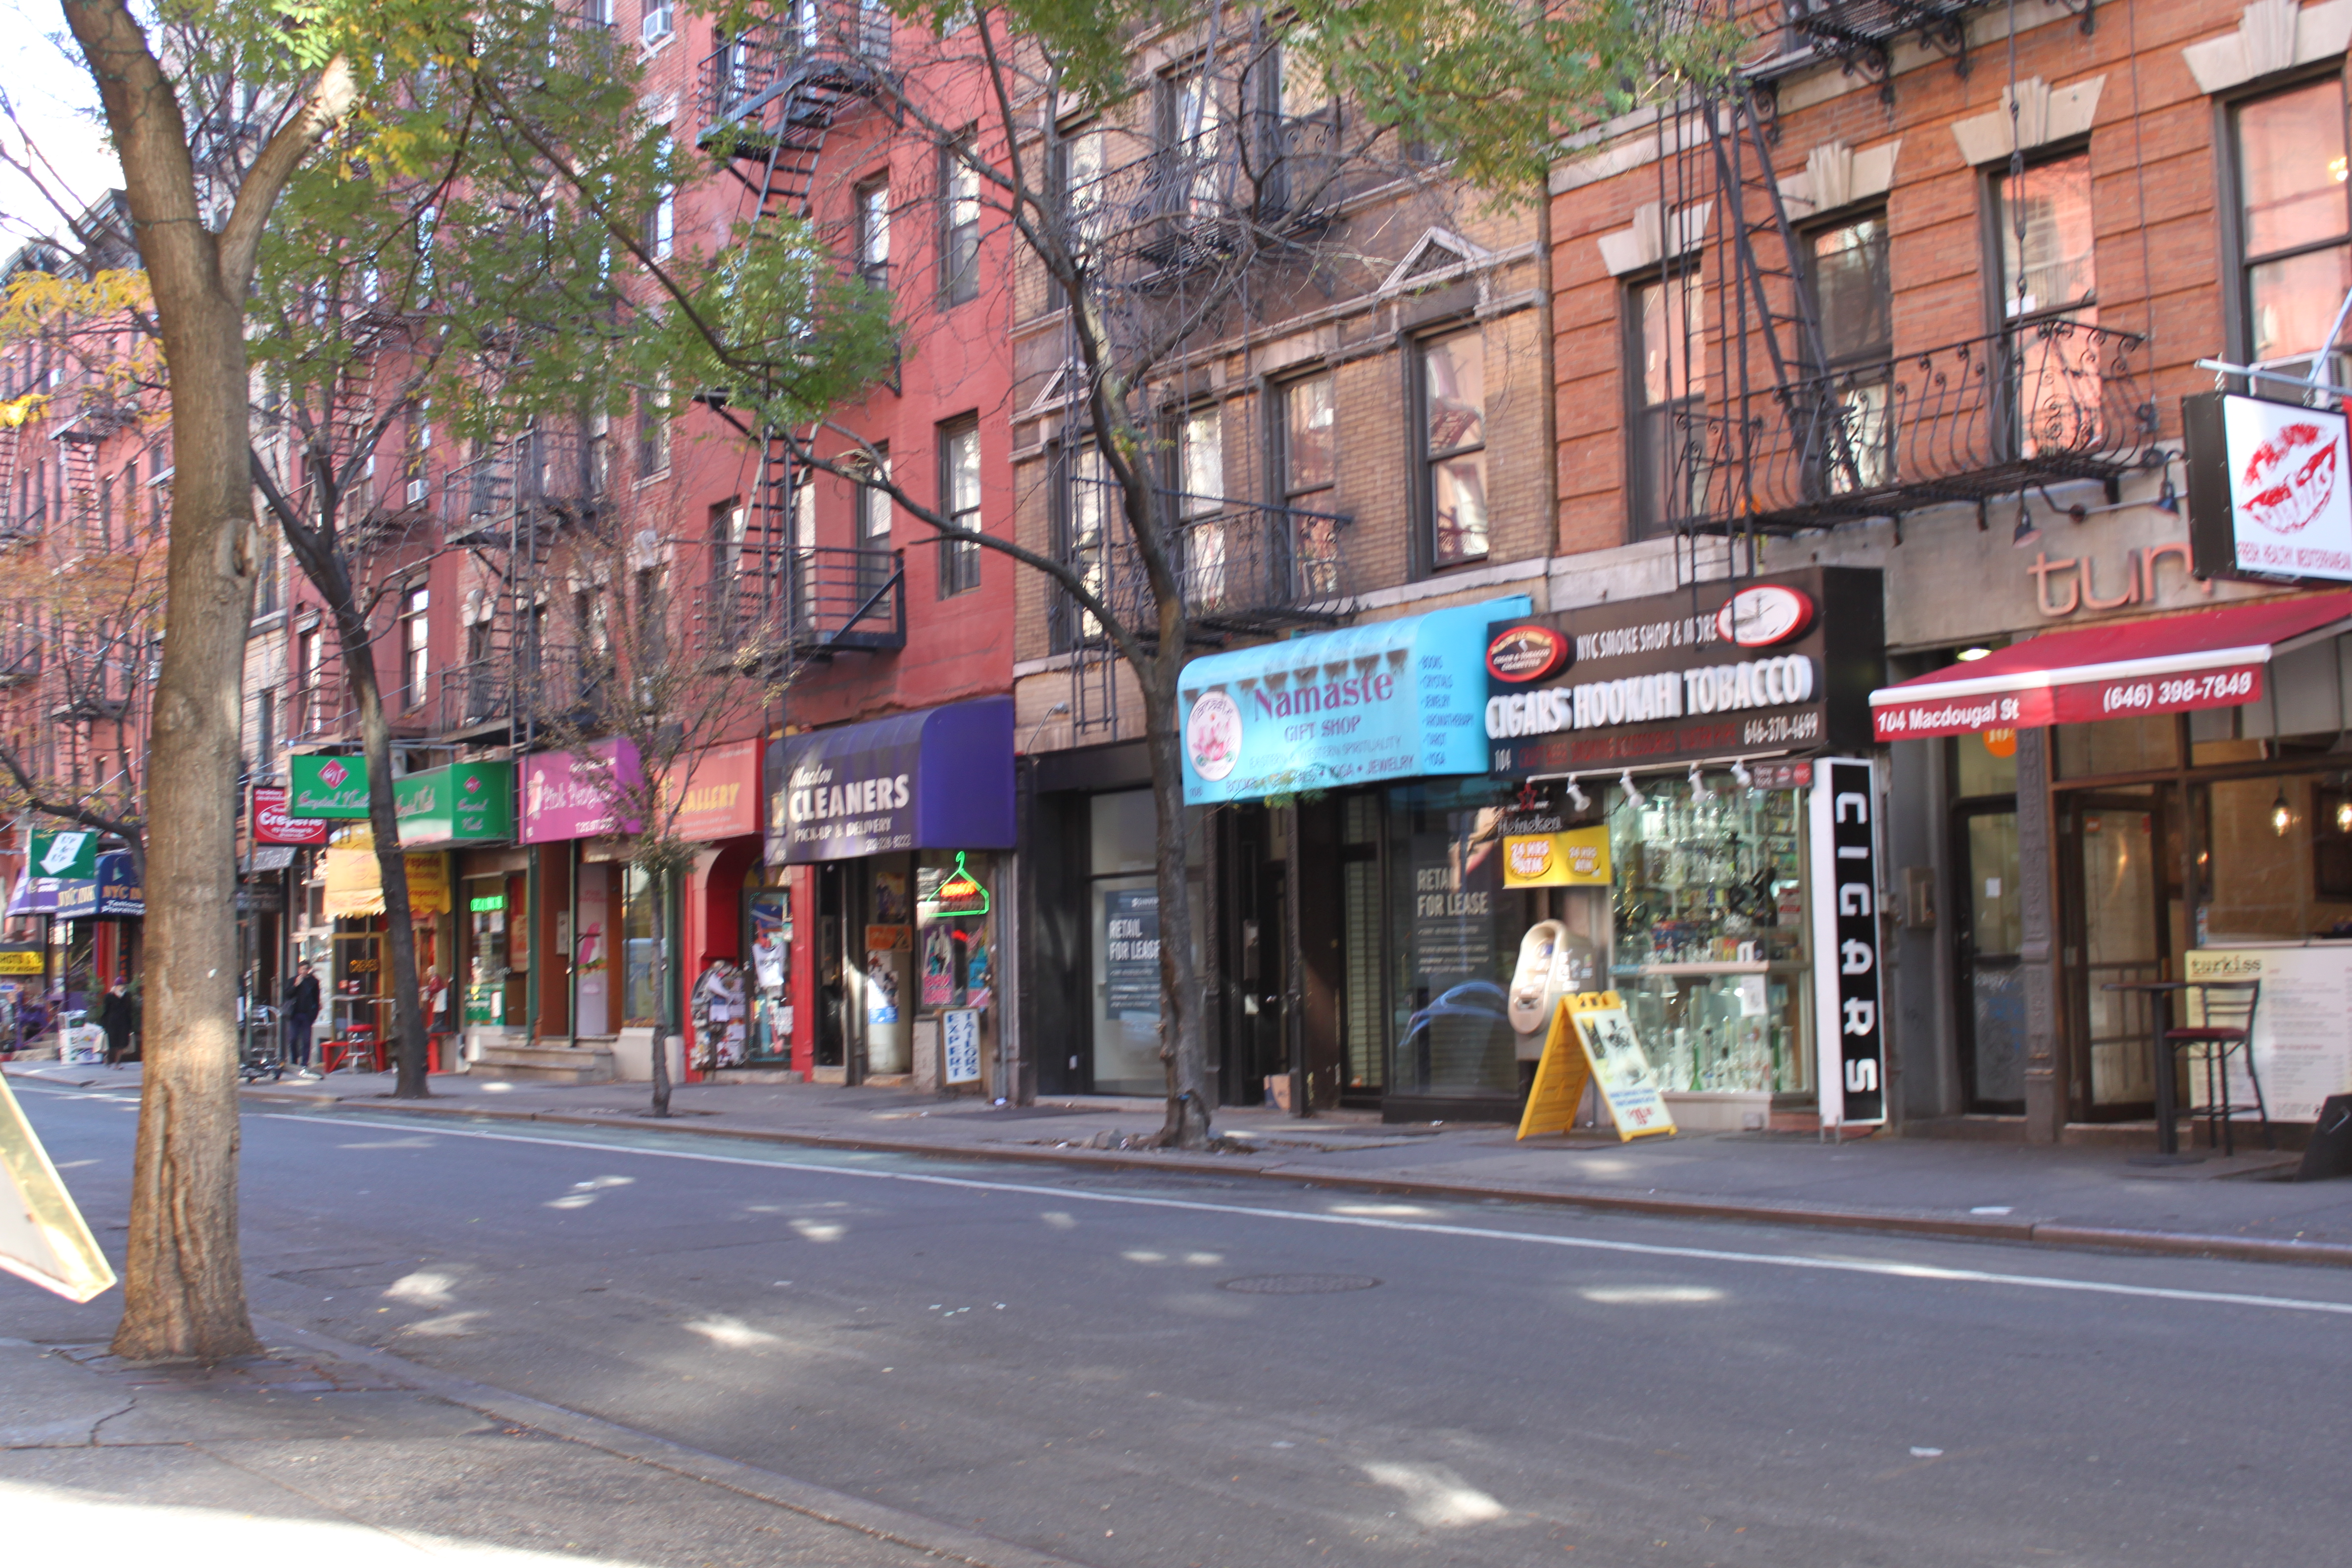 Greenwich Village in New York City. (Photos courtesy Allison Carter)